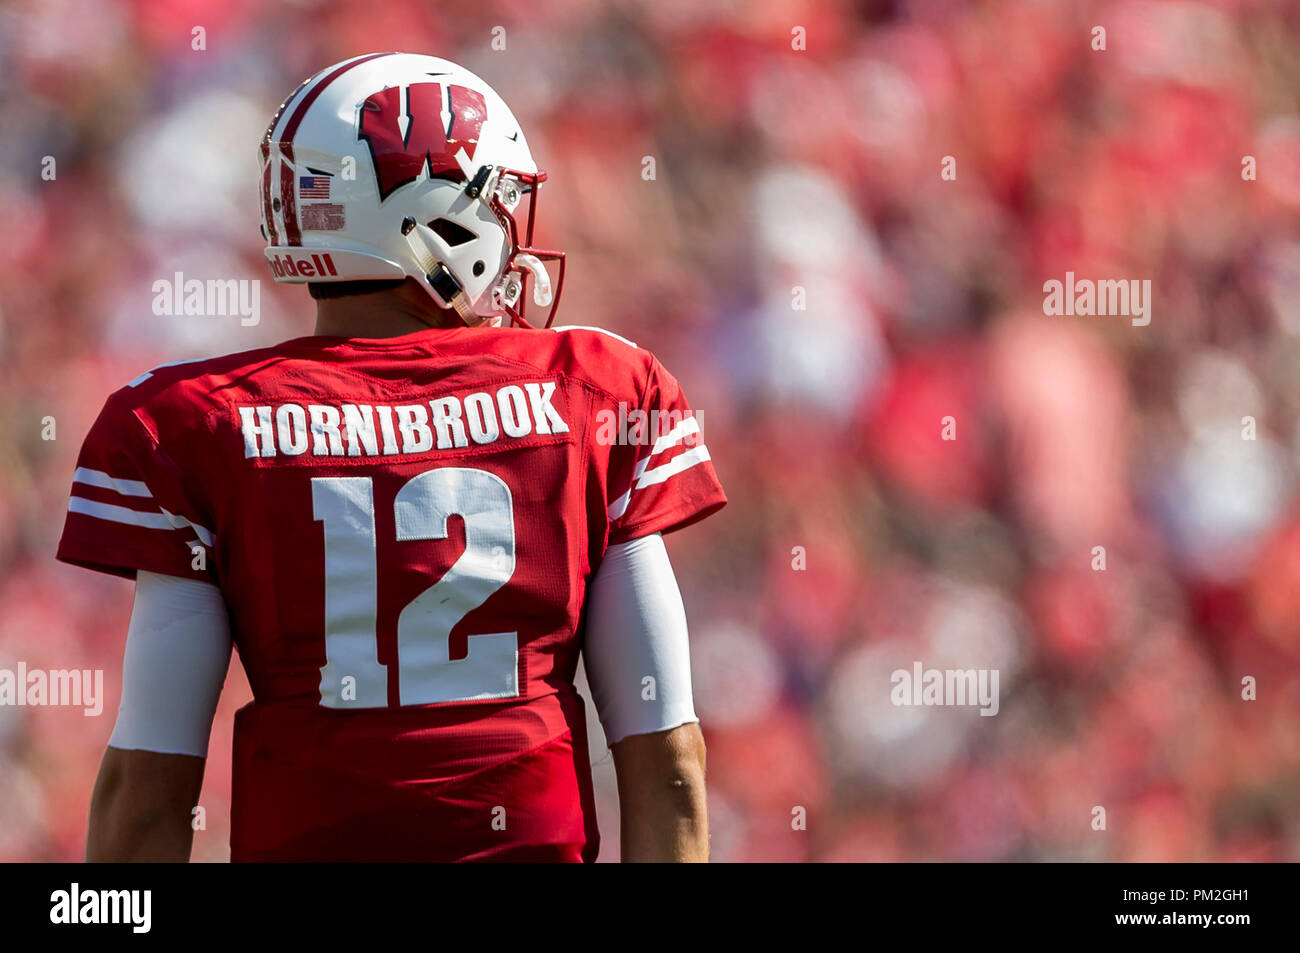 Alex Hornibrook Wisconsin Badgers Football Jersey Red